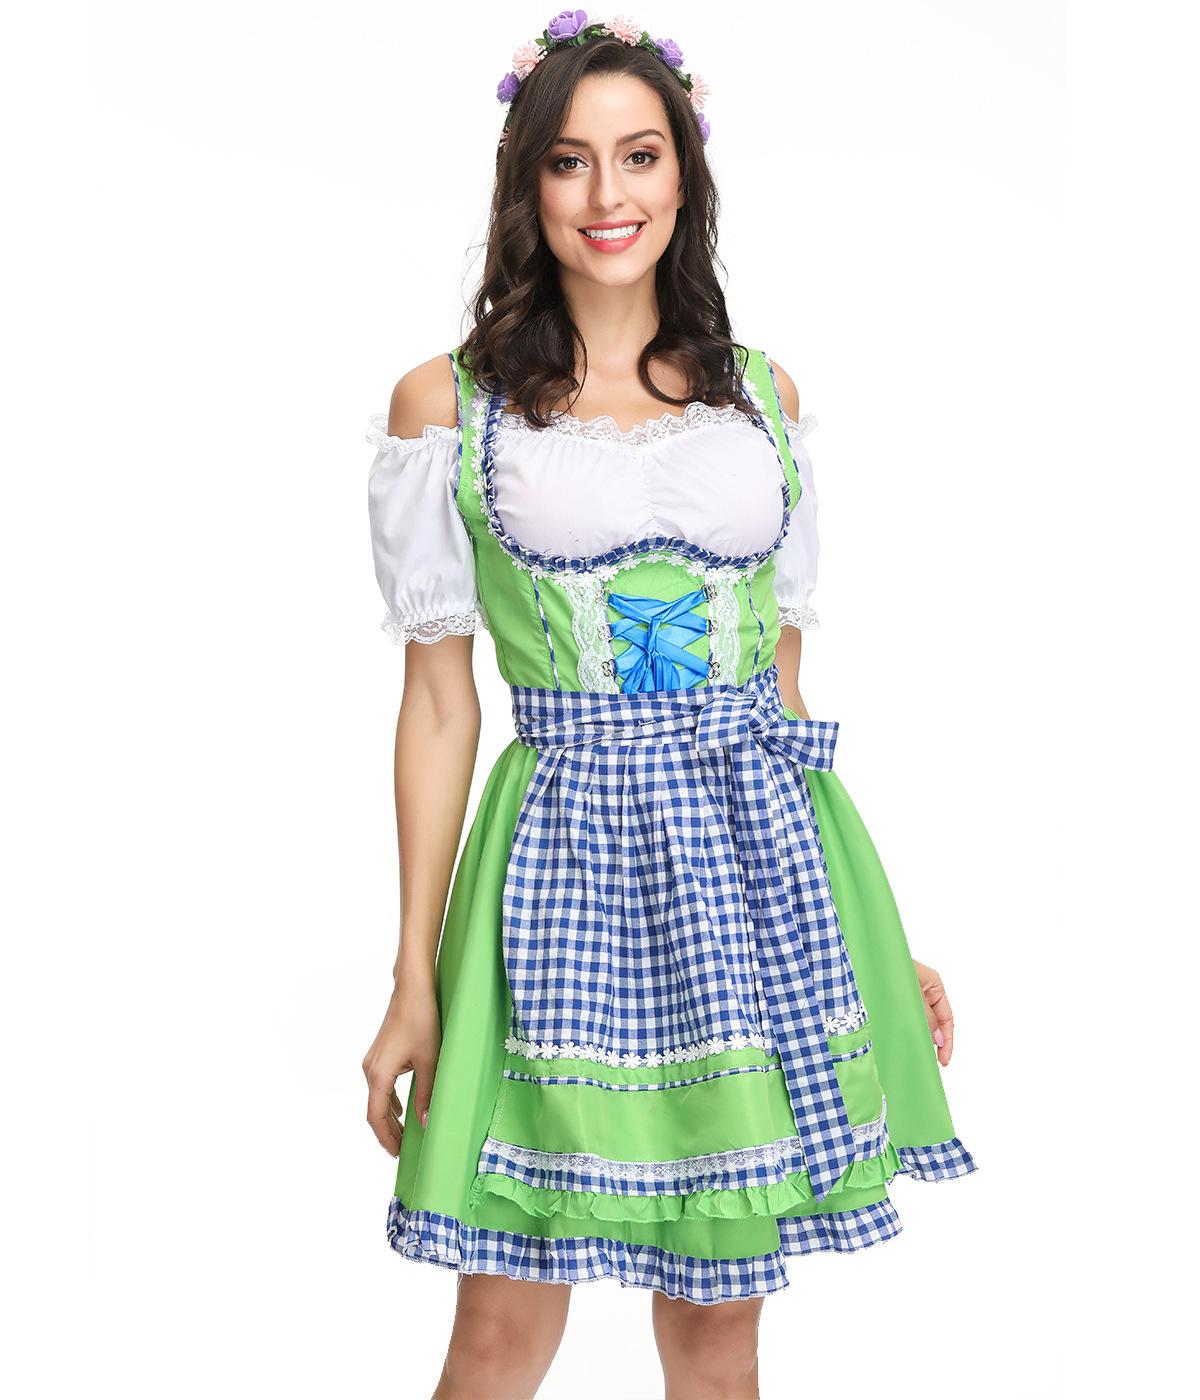 Women Oktoberfest Dirndl Off-shoulder Maid Cosplay Dress Costume Beer Festival Dress green_XL